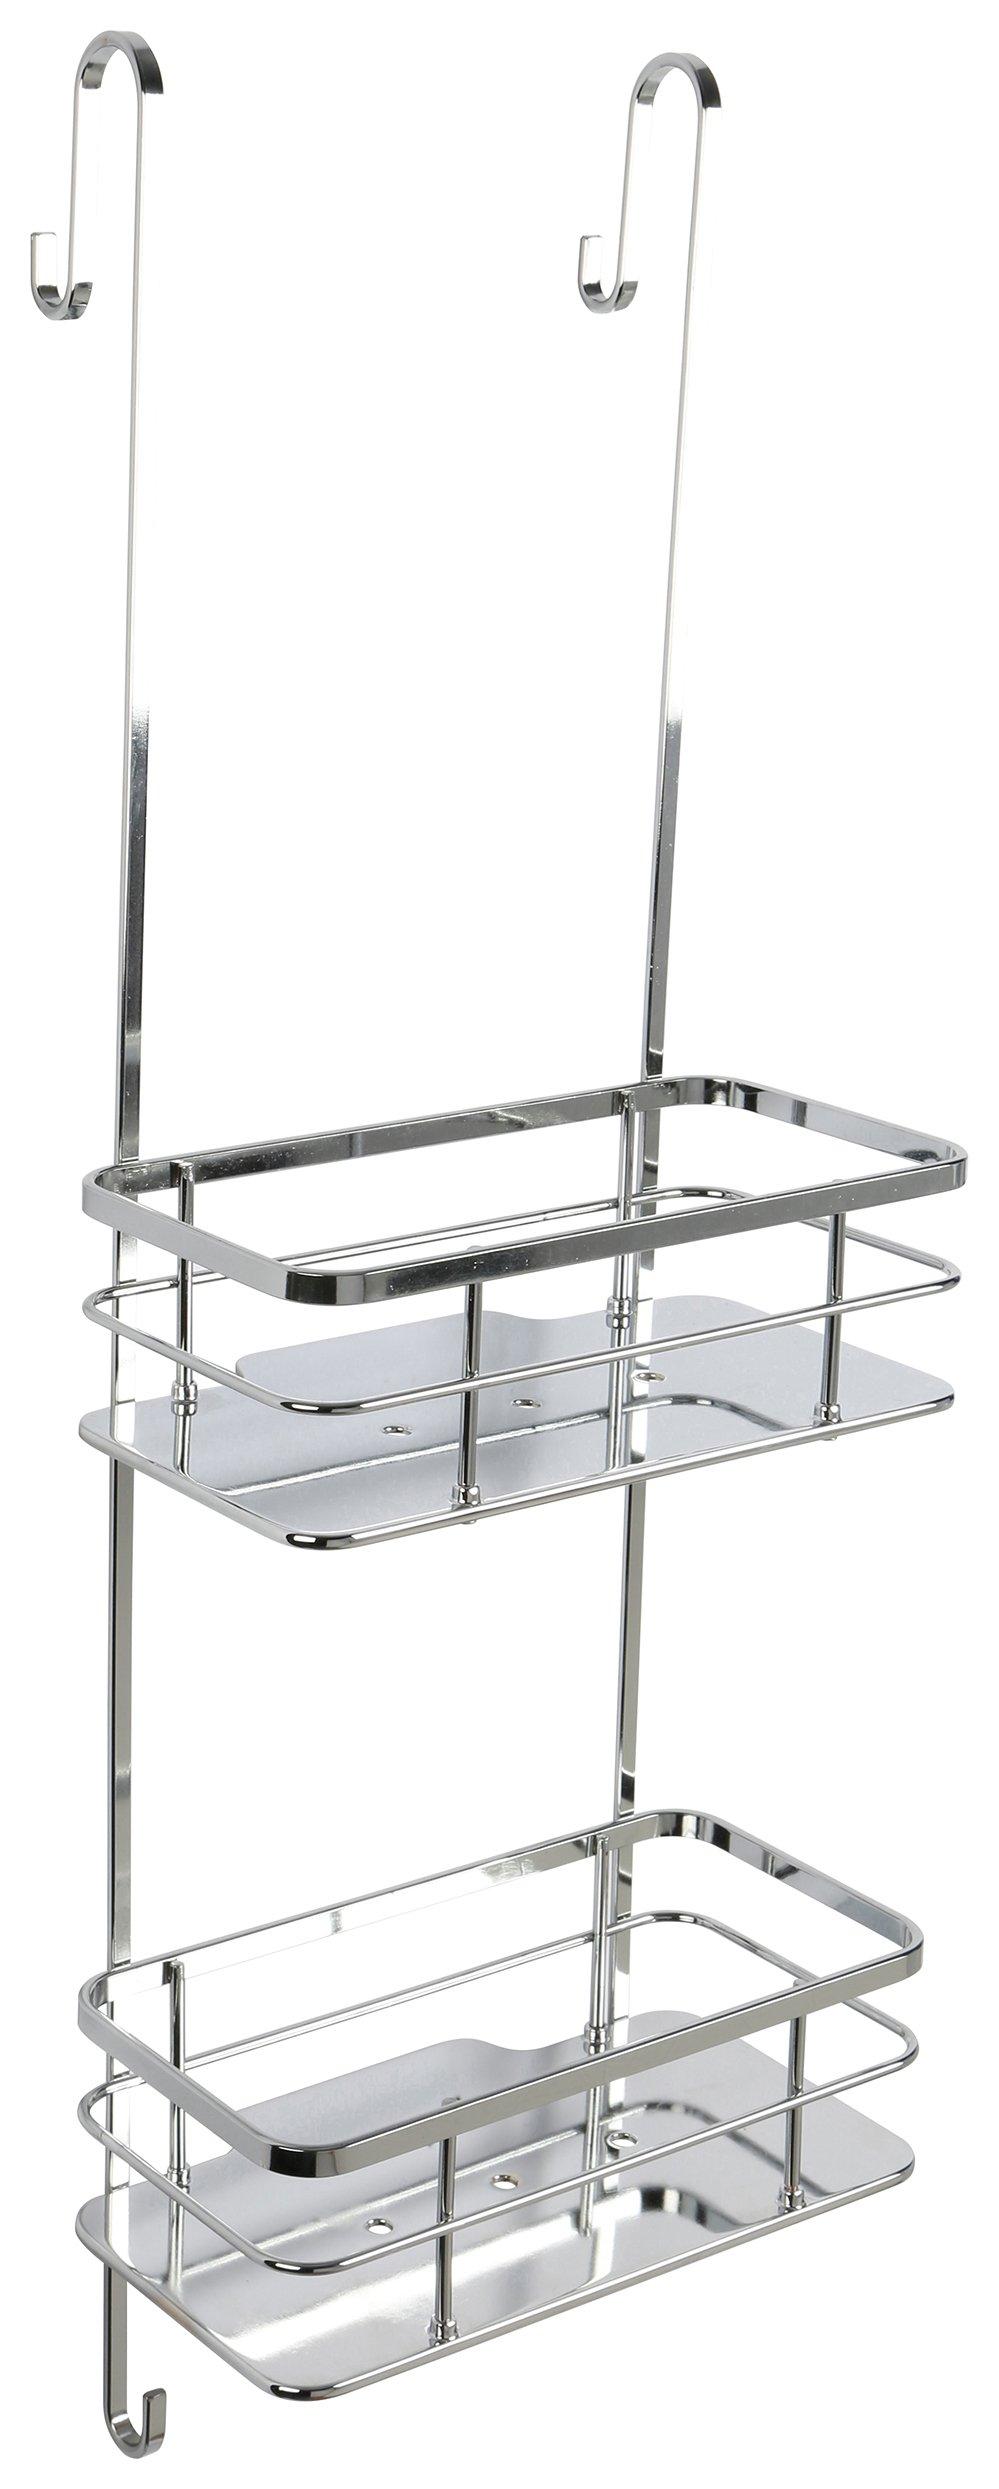 bathroom baskets bathroom caddies and shower caddies. Black Bedroom Furniture Sets. Home Design Ideas